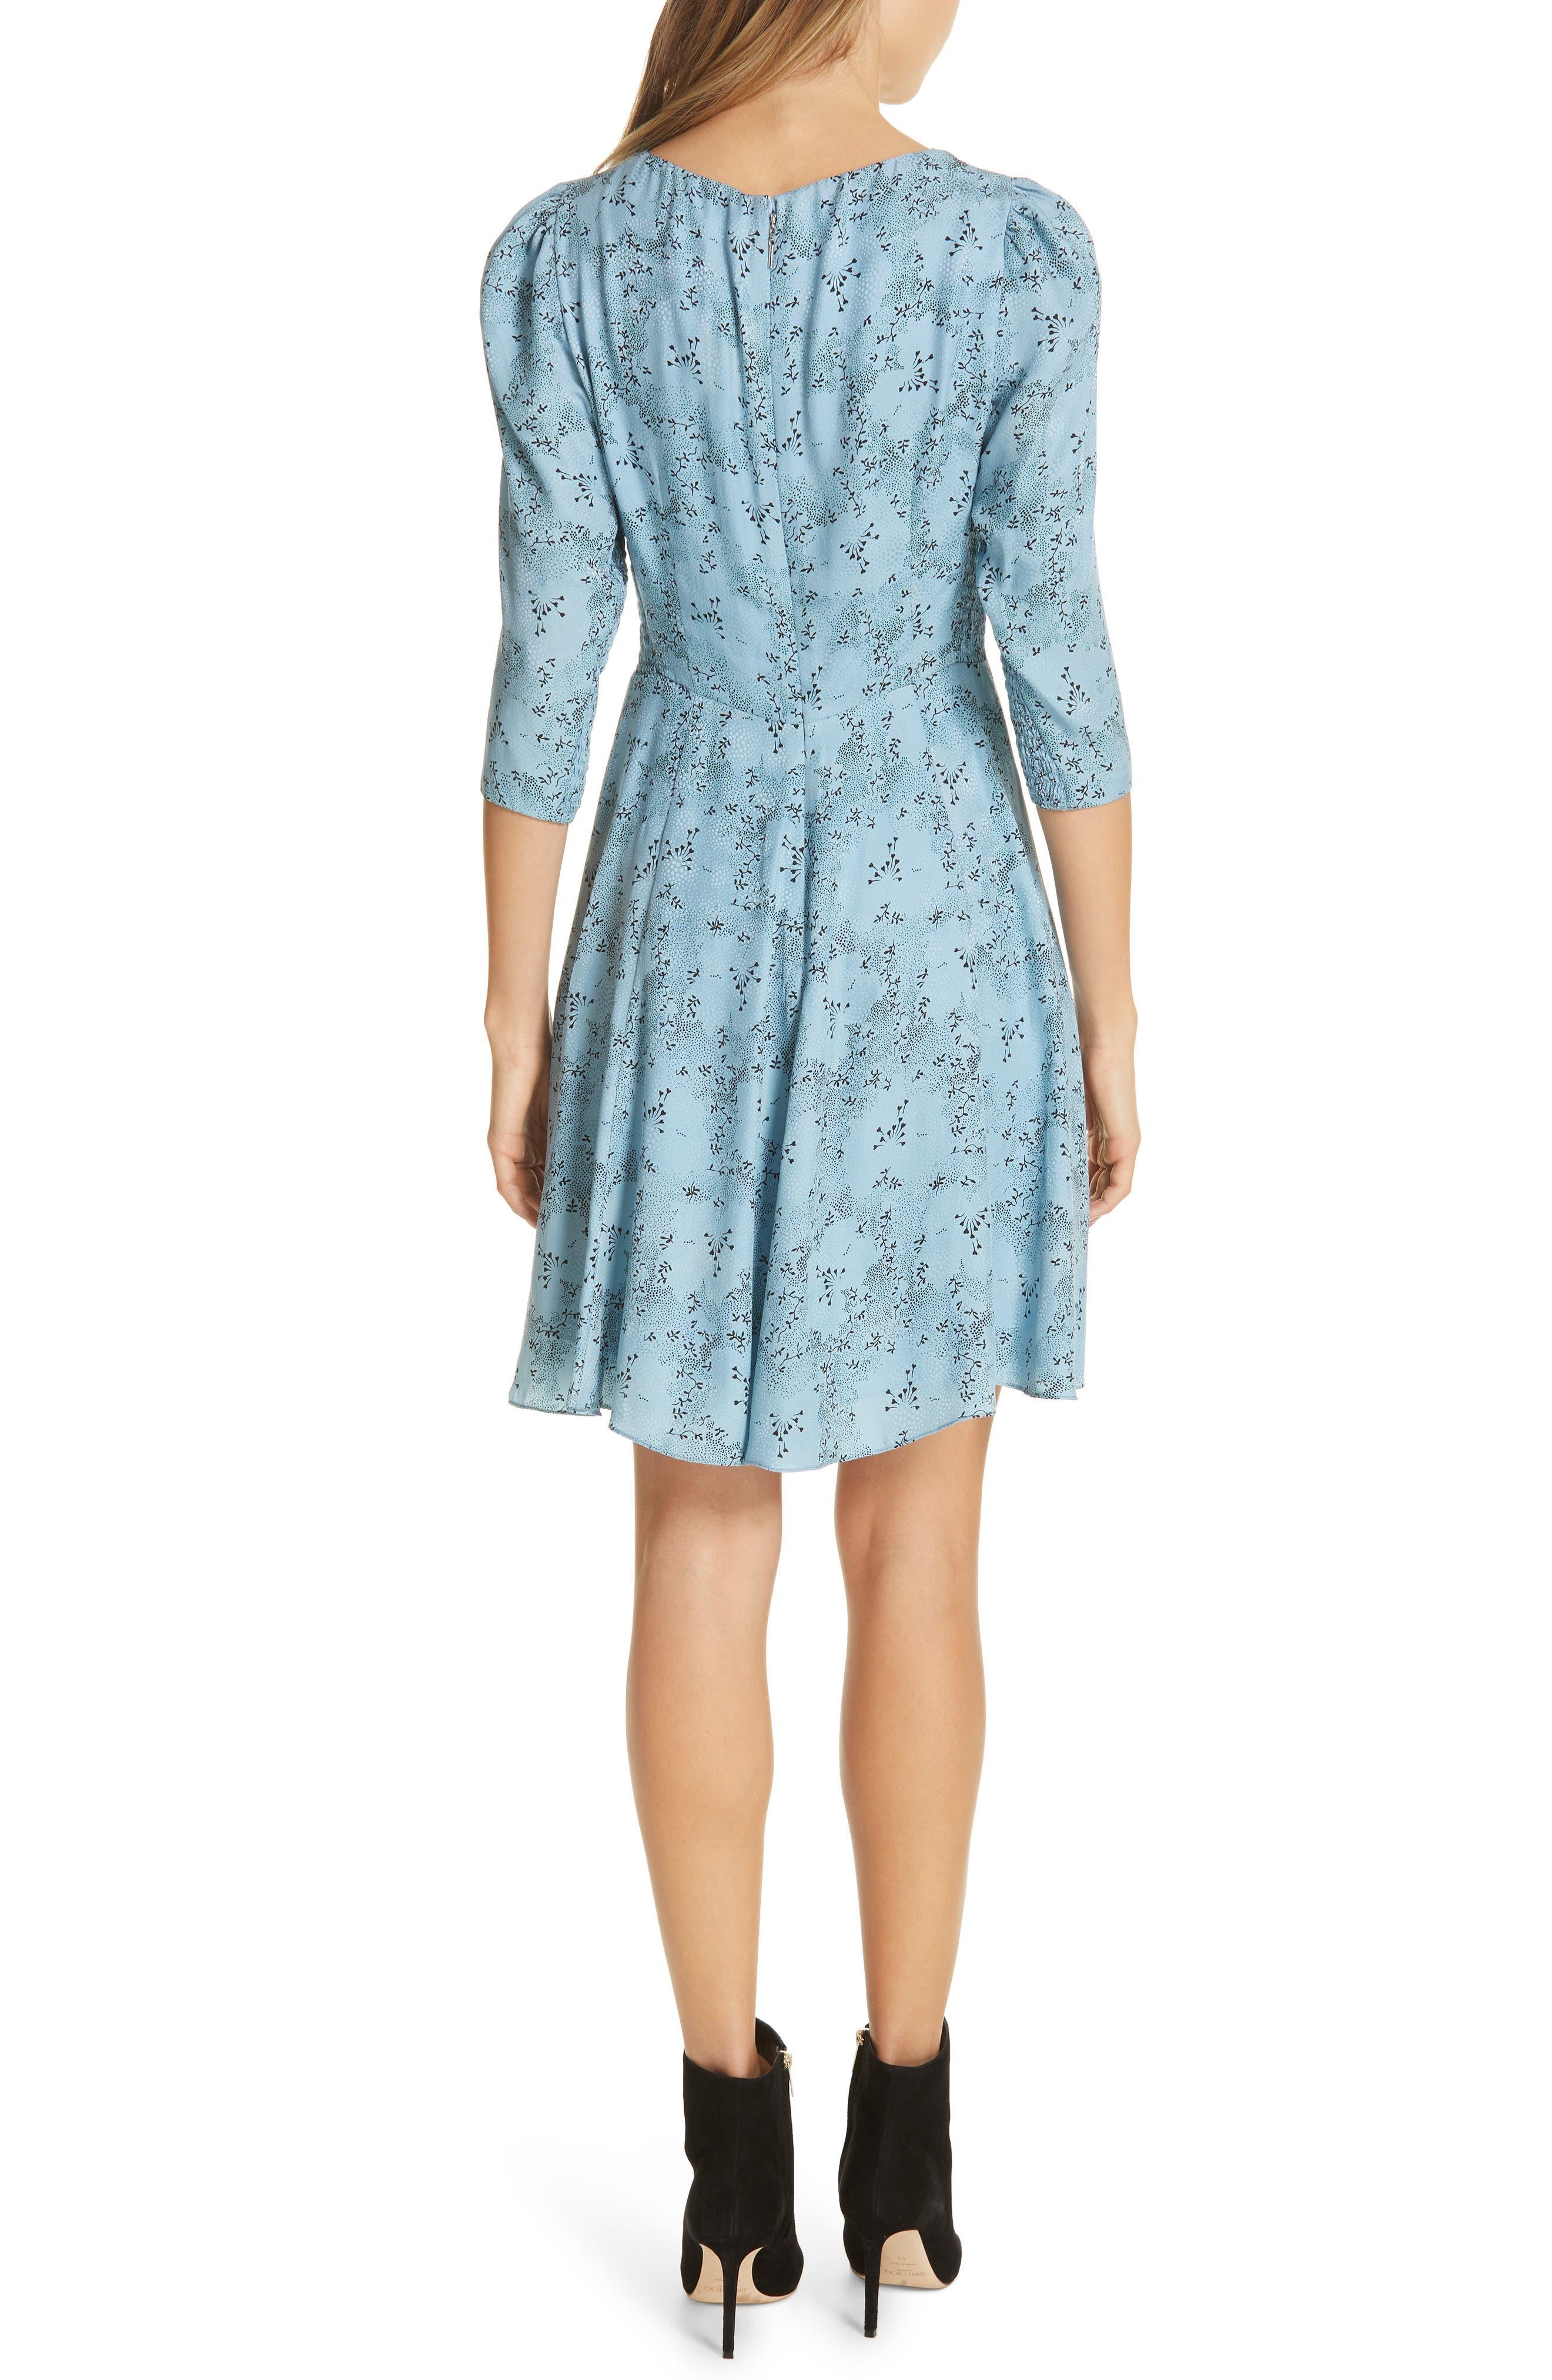 REBECCA TAYLOR, Gianna Floral Silk Dress, Alternate thumbnail 2, color, LAGOON COMBO